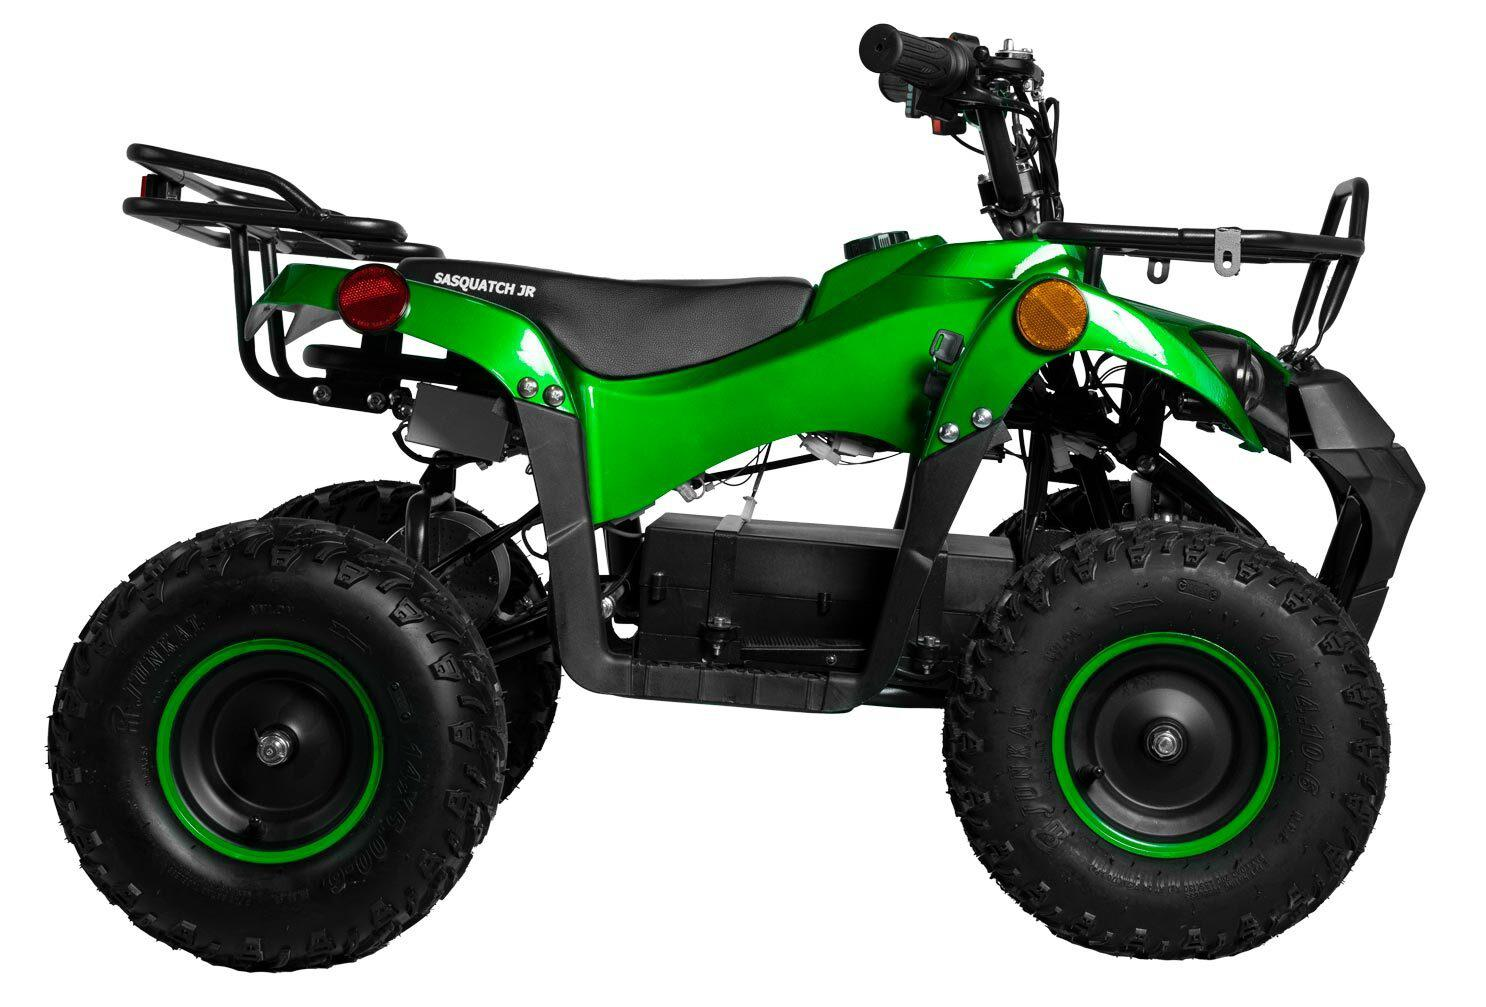 Daymak Sasquatch Jr Electric ATV 36V 350W (Red, Blue or Yellow) 2021